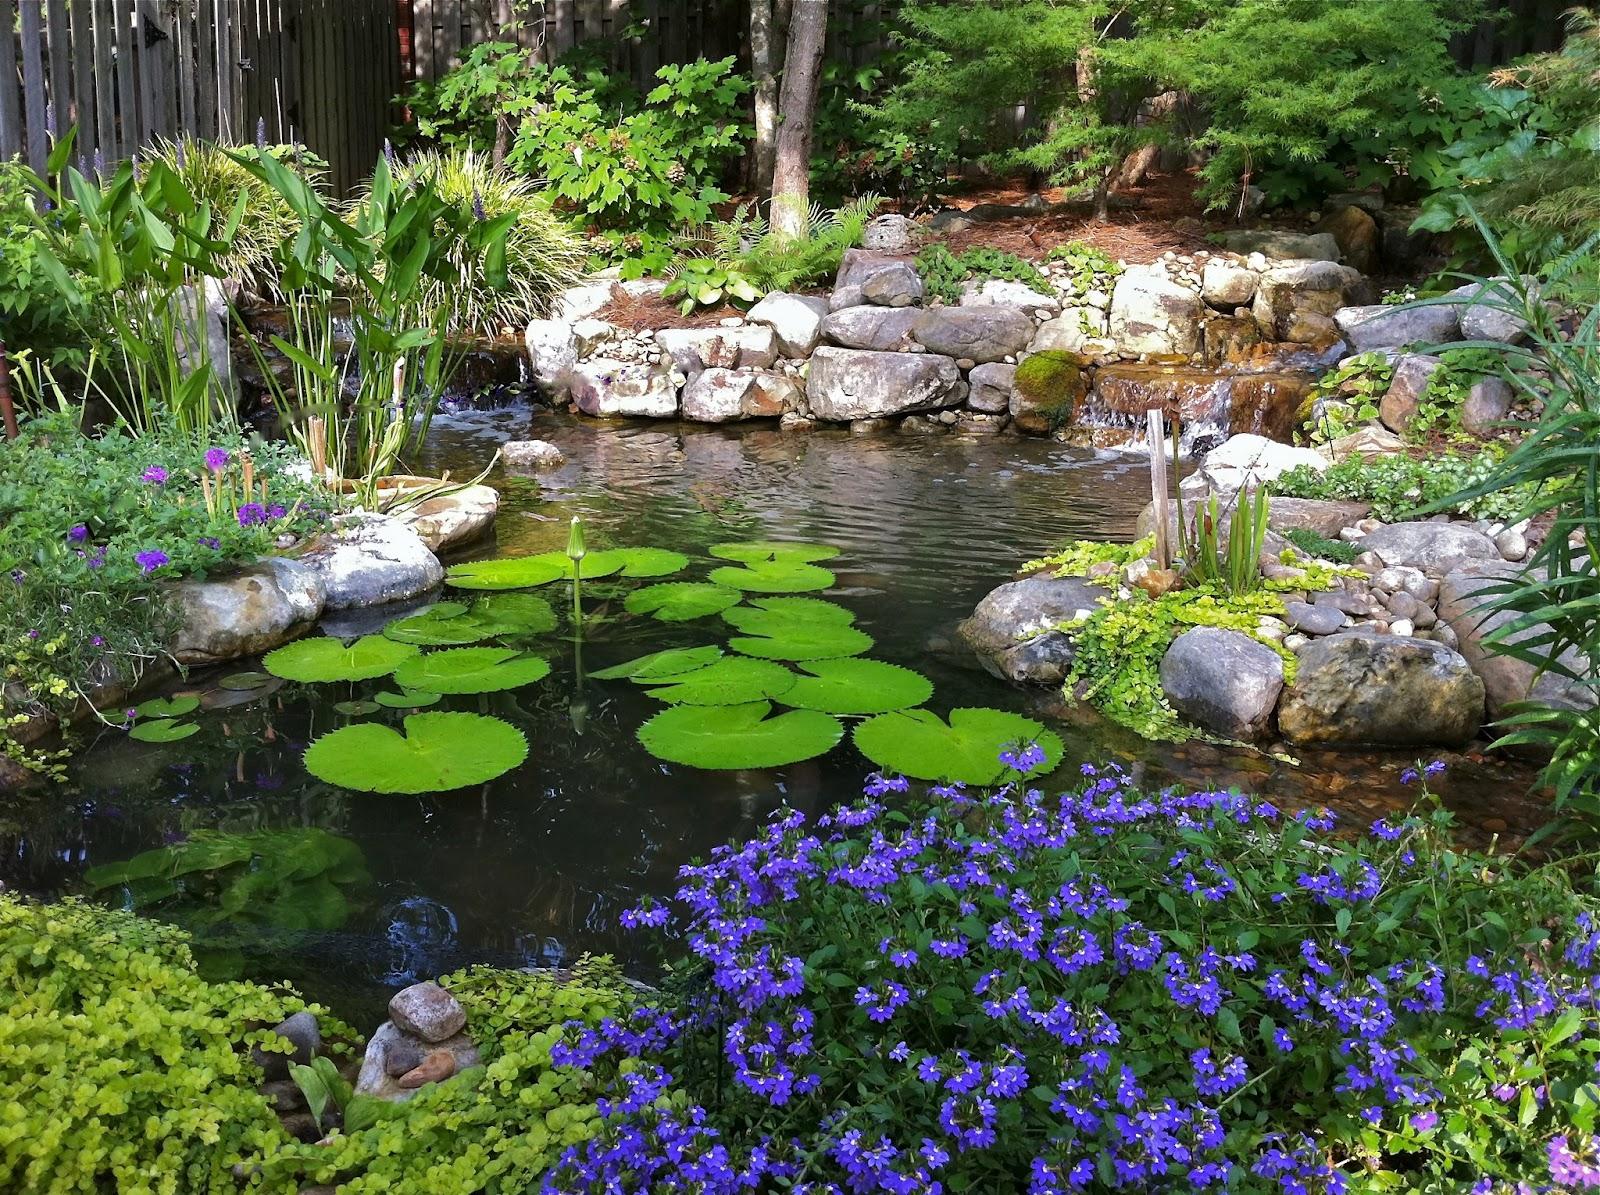 Inspirasi penggunaan fitur kolam pada Zen Garden - source: alabamaaquarium.com